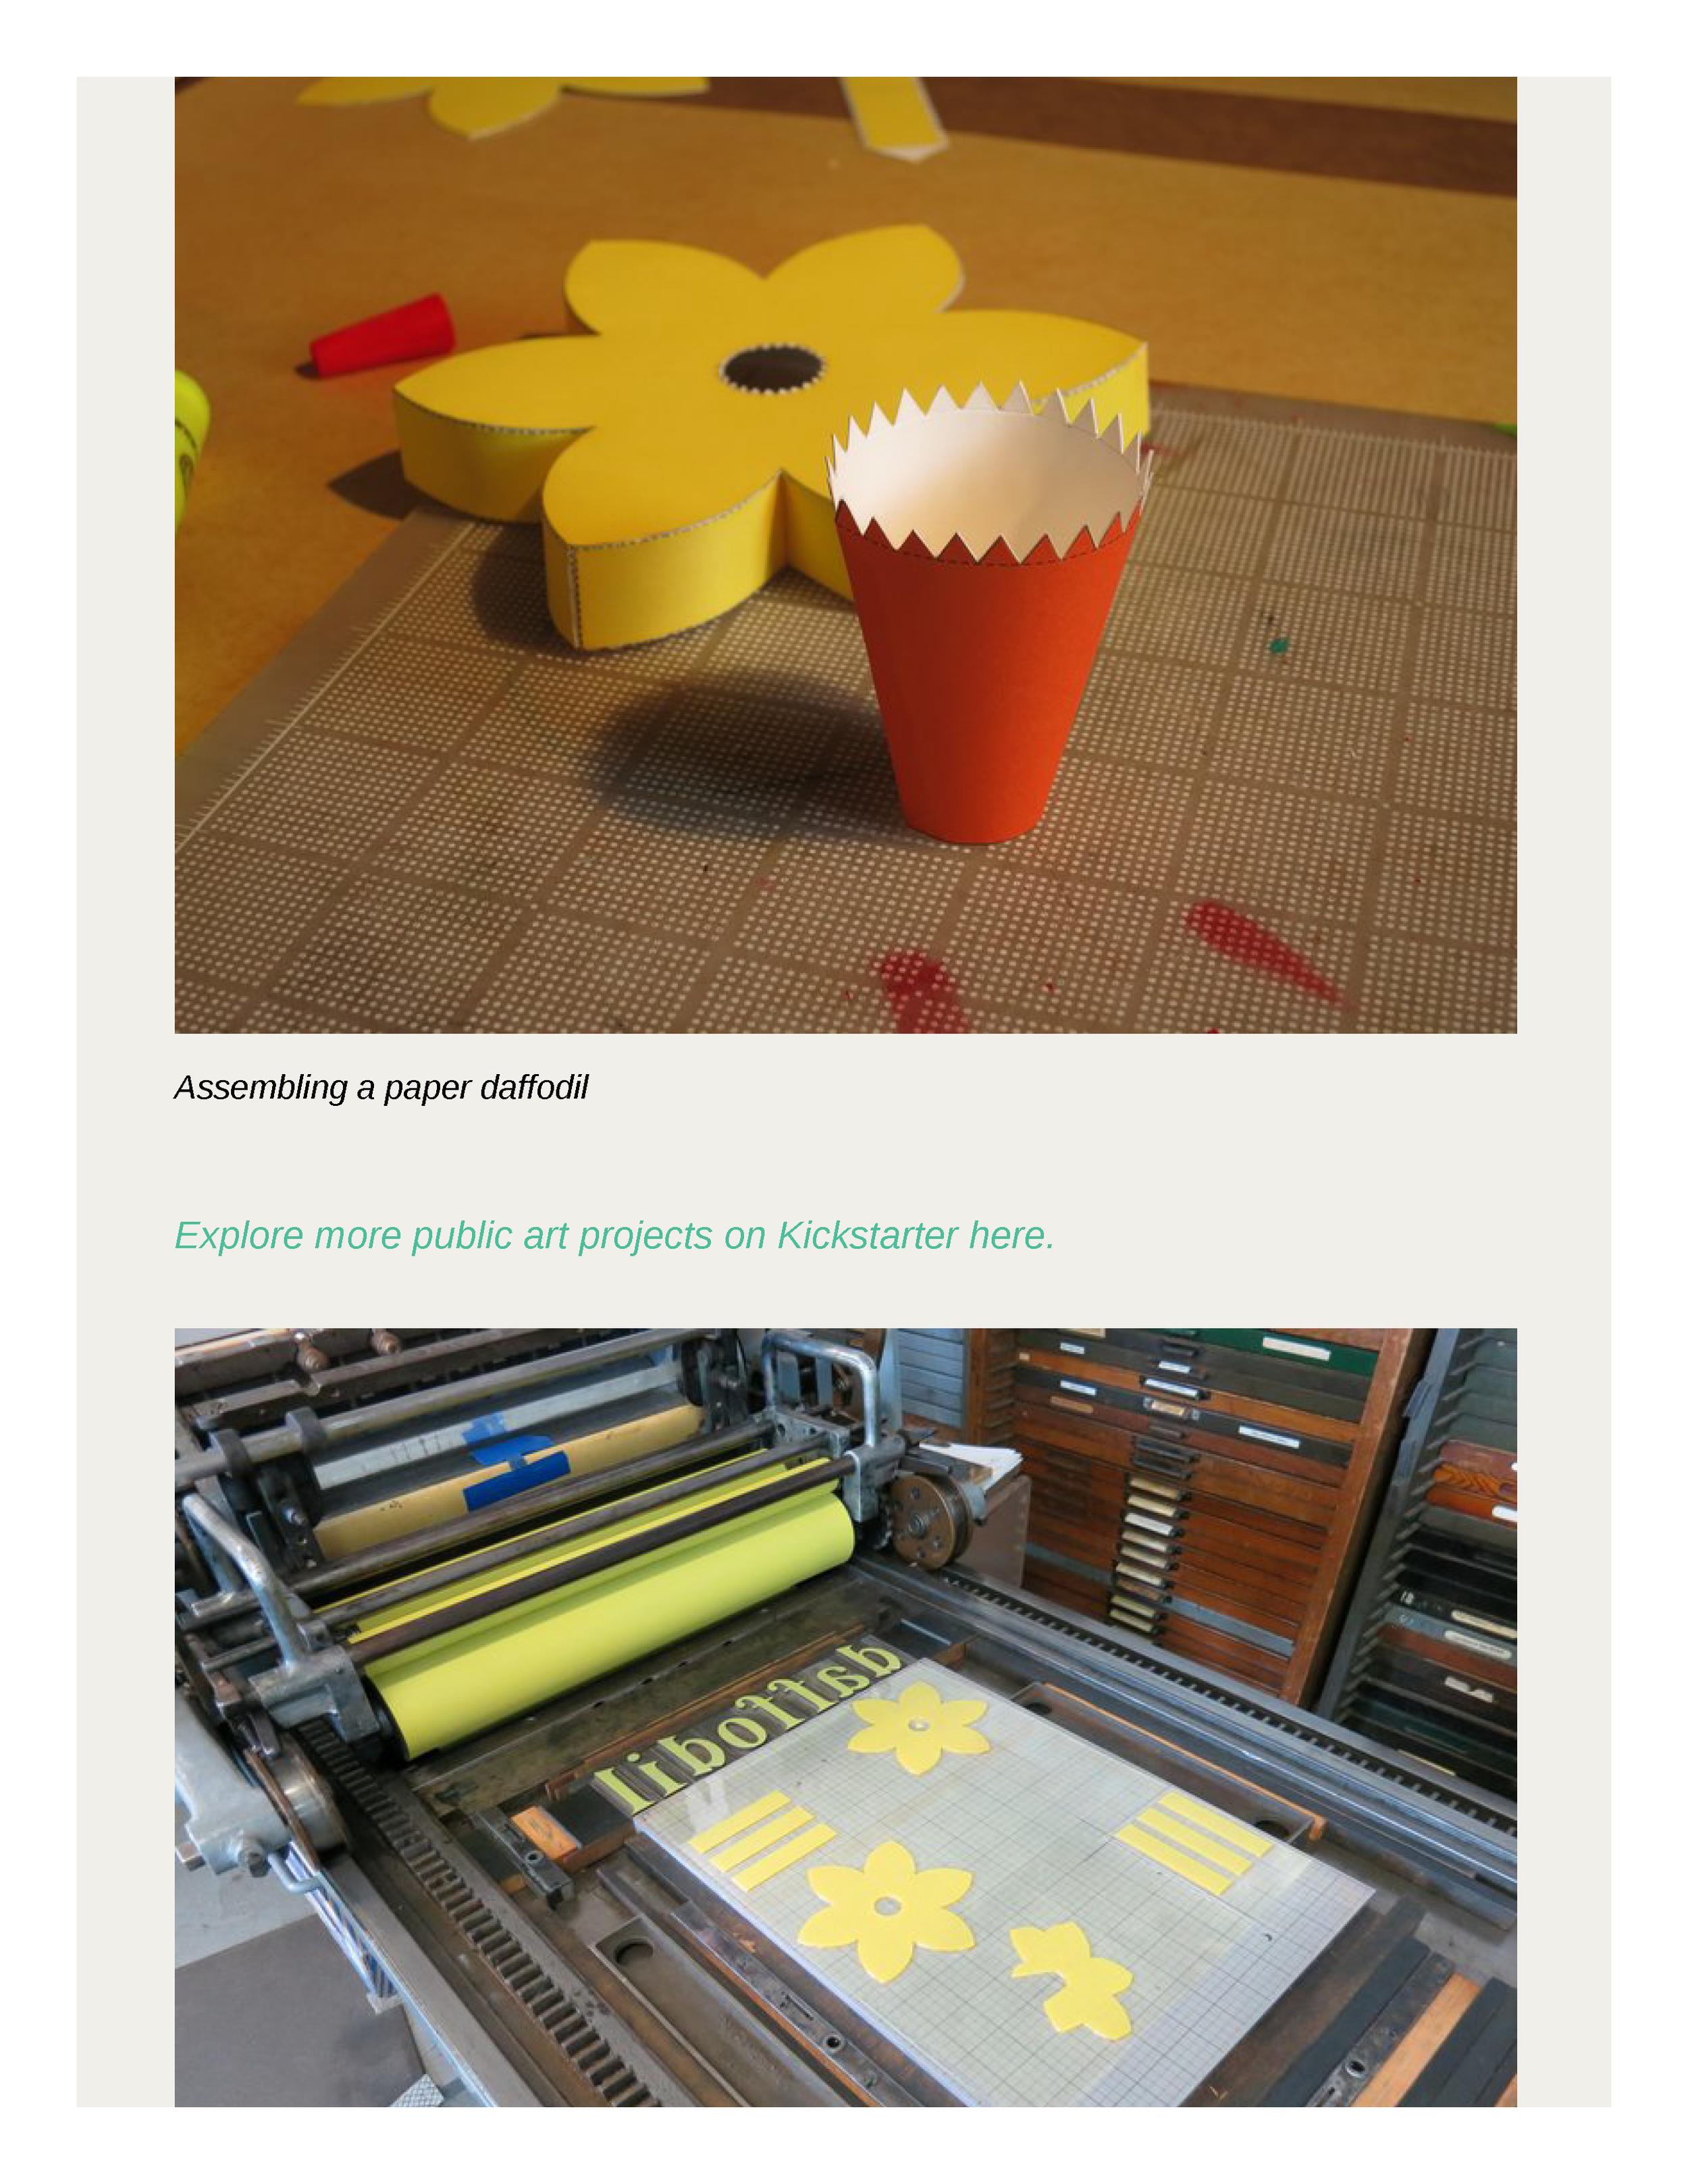 Kickstarter_Page_2.png